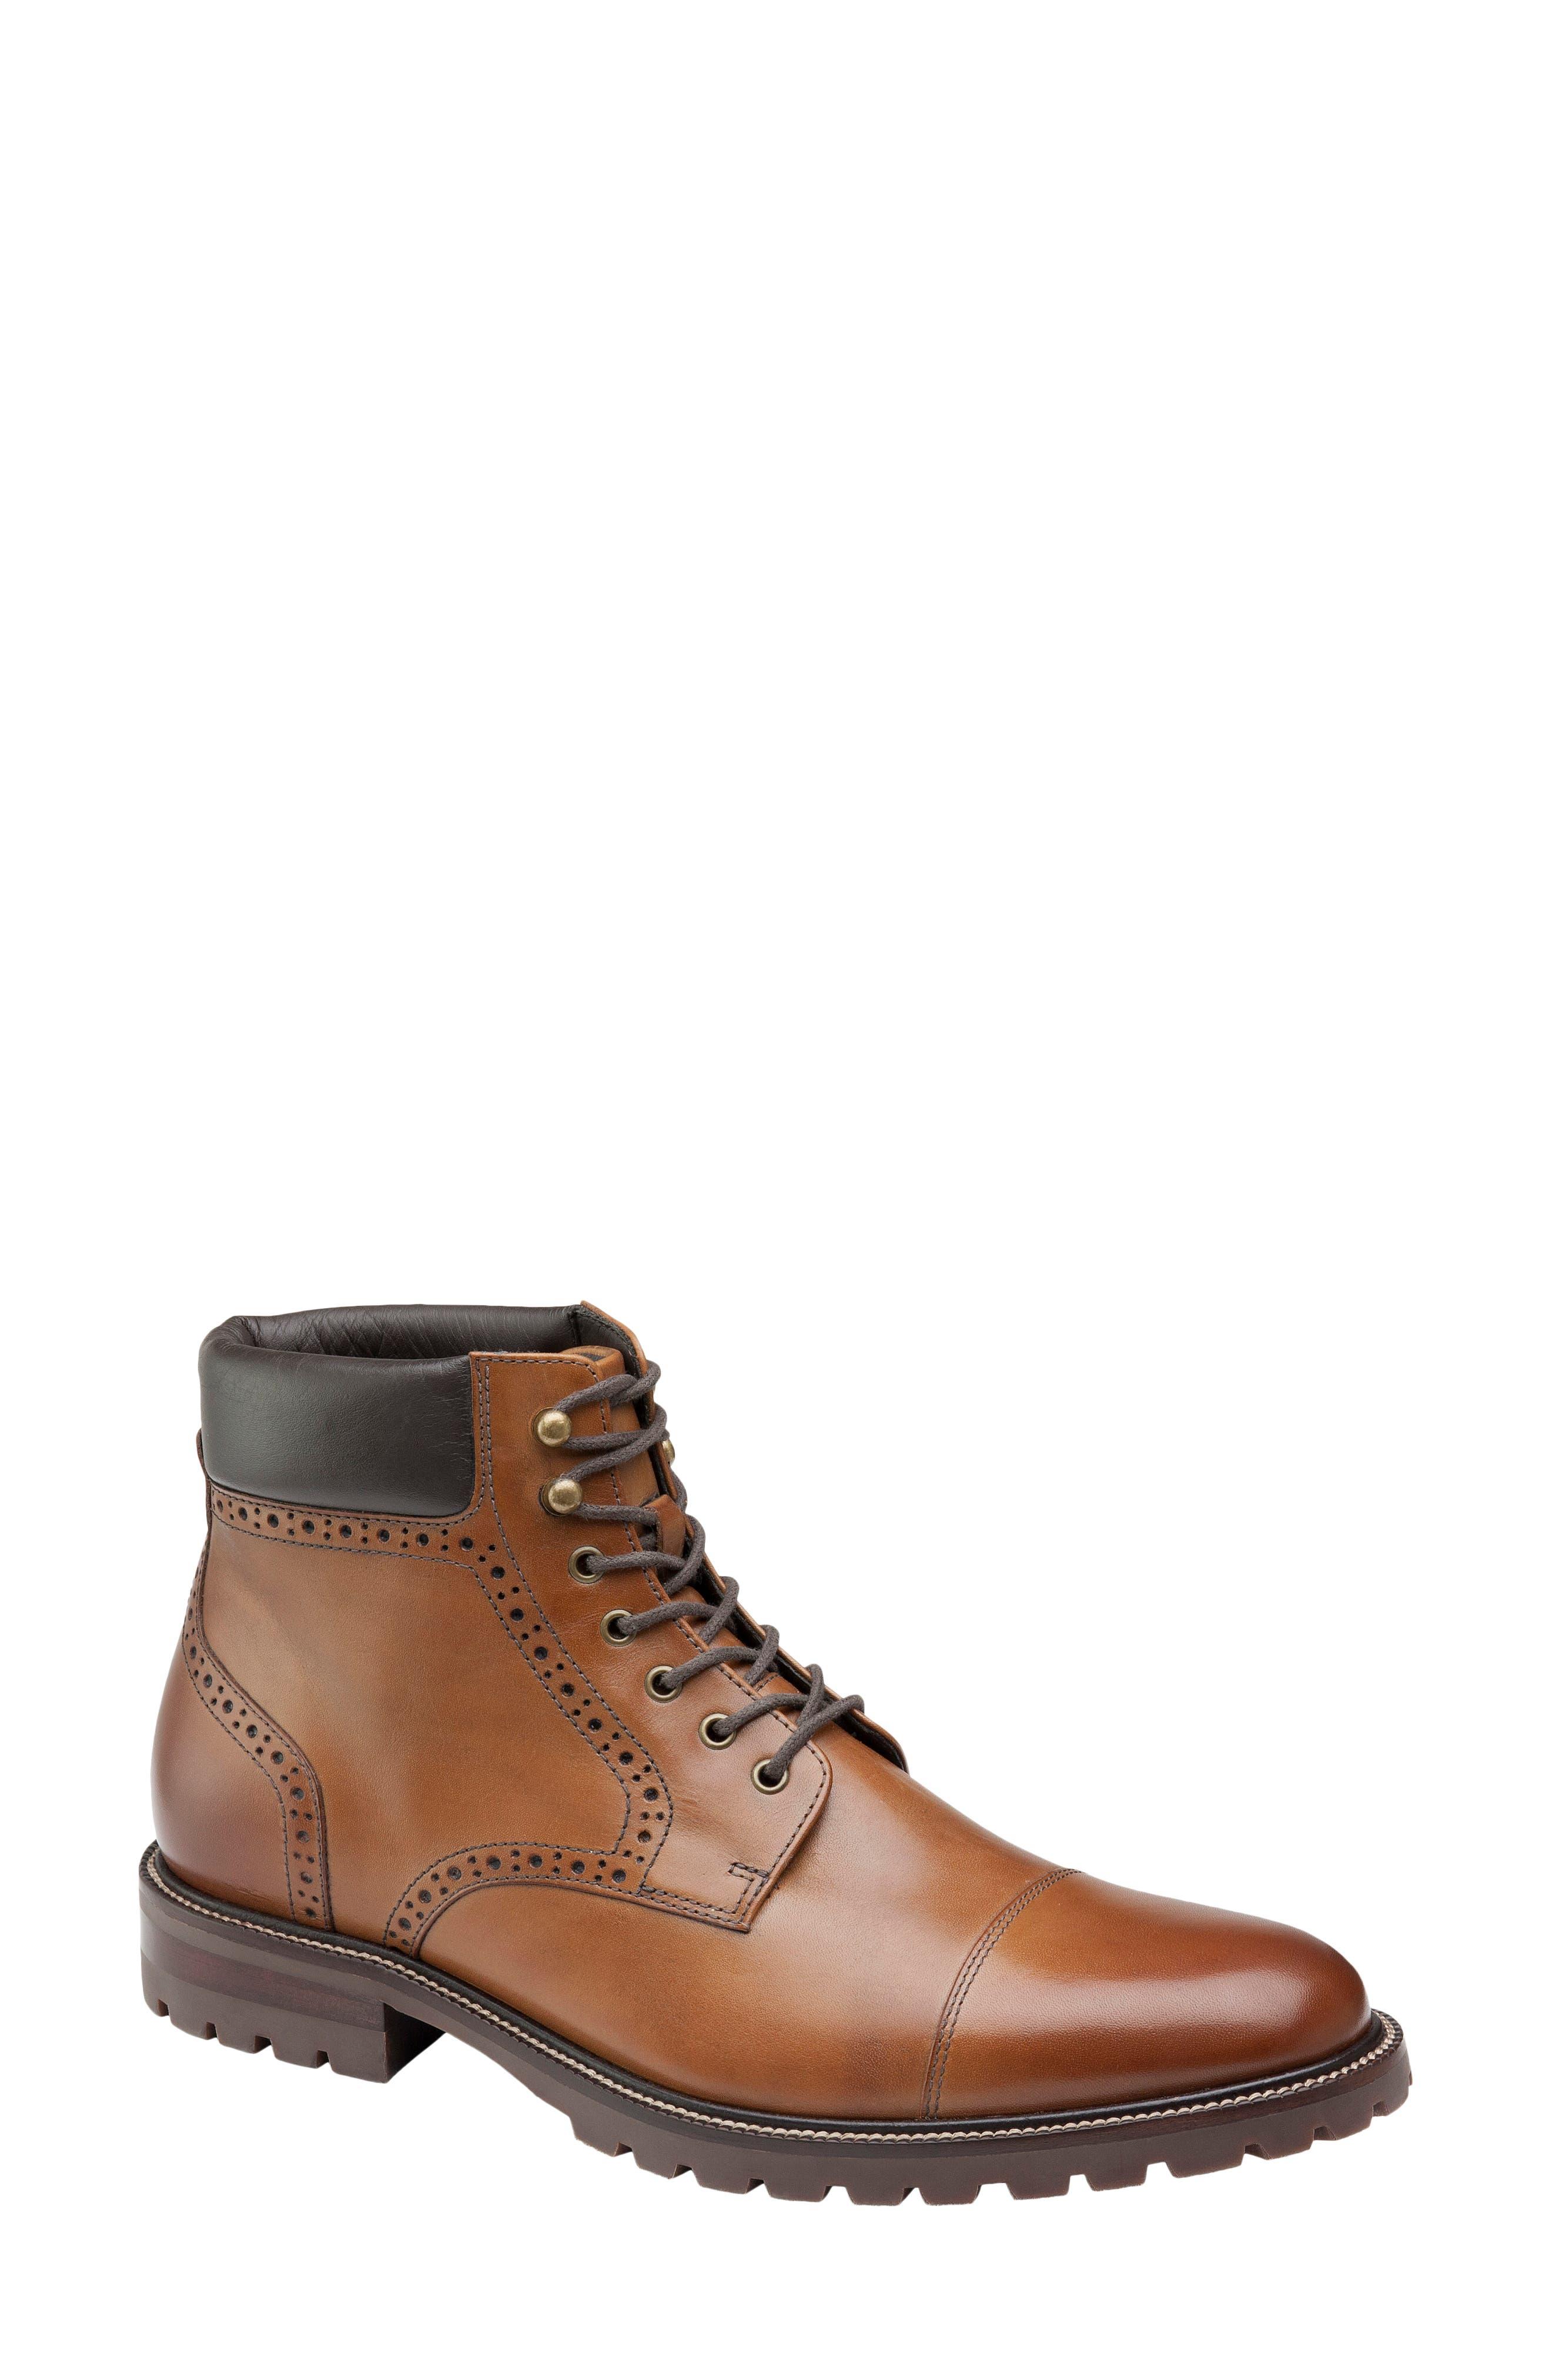 Hobson Cap Toe Boot